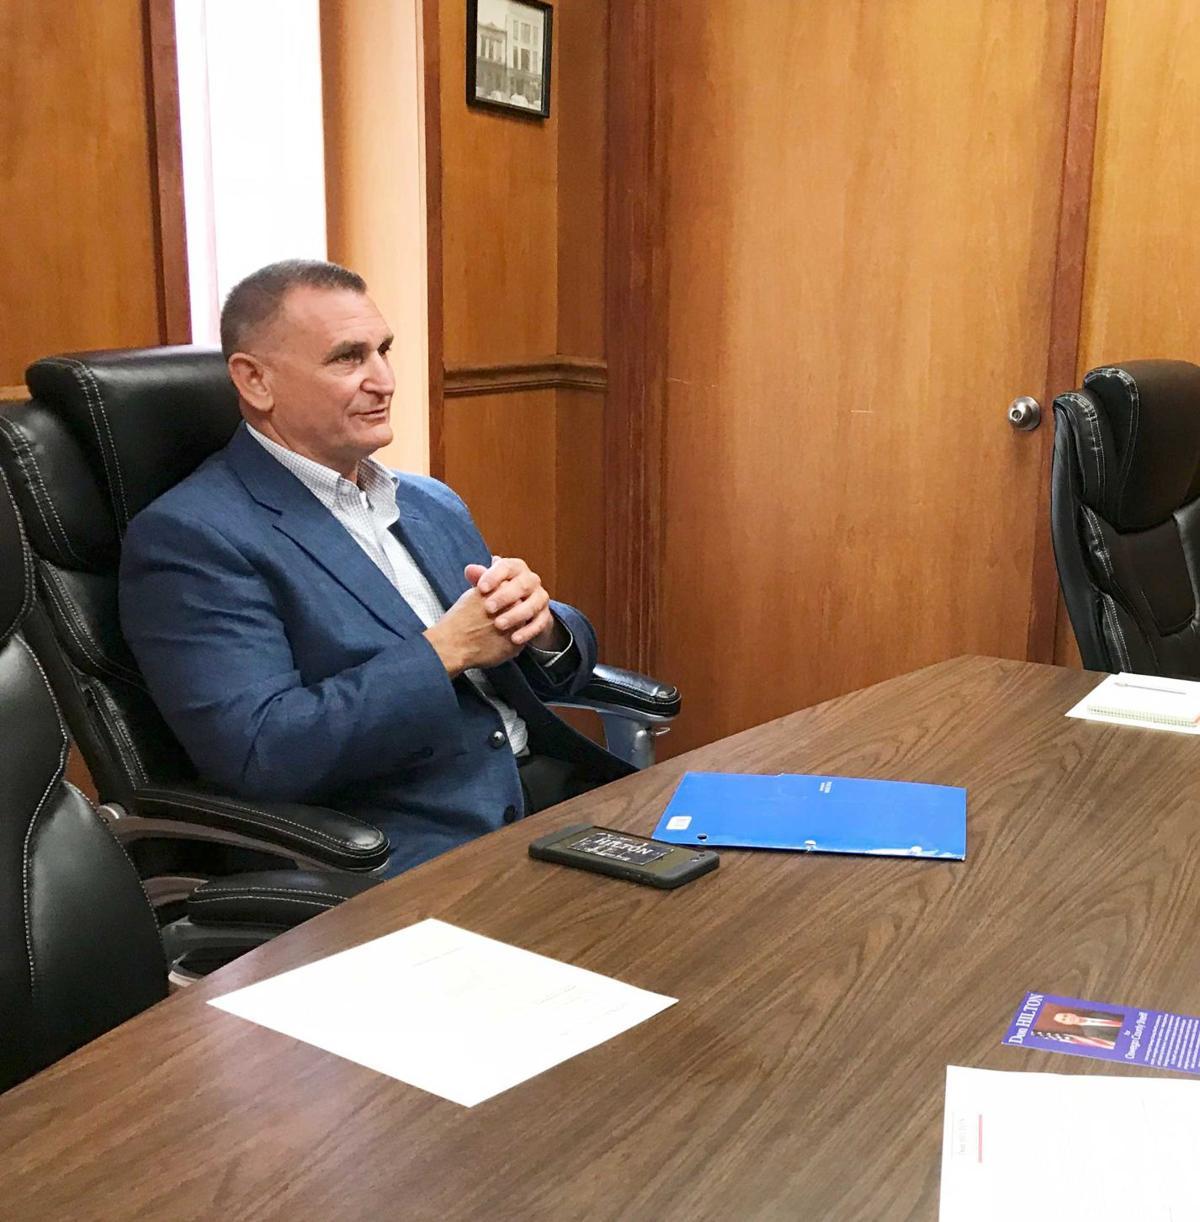 Sheriff-Elect Hilton announces key staff appointments